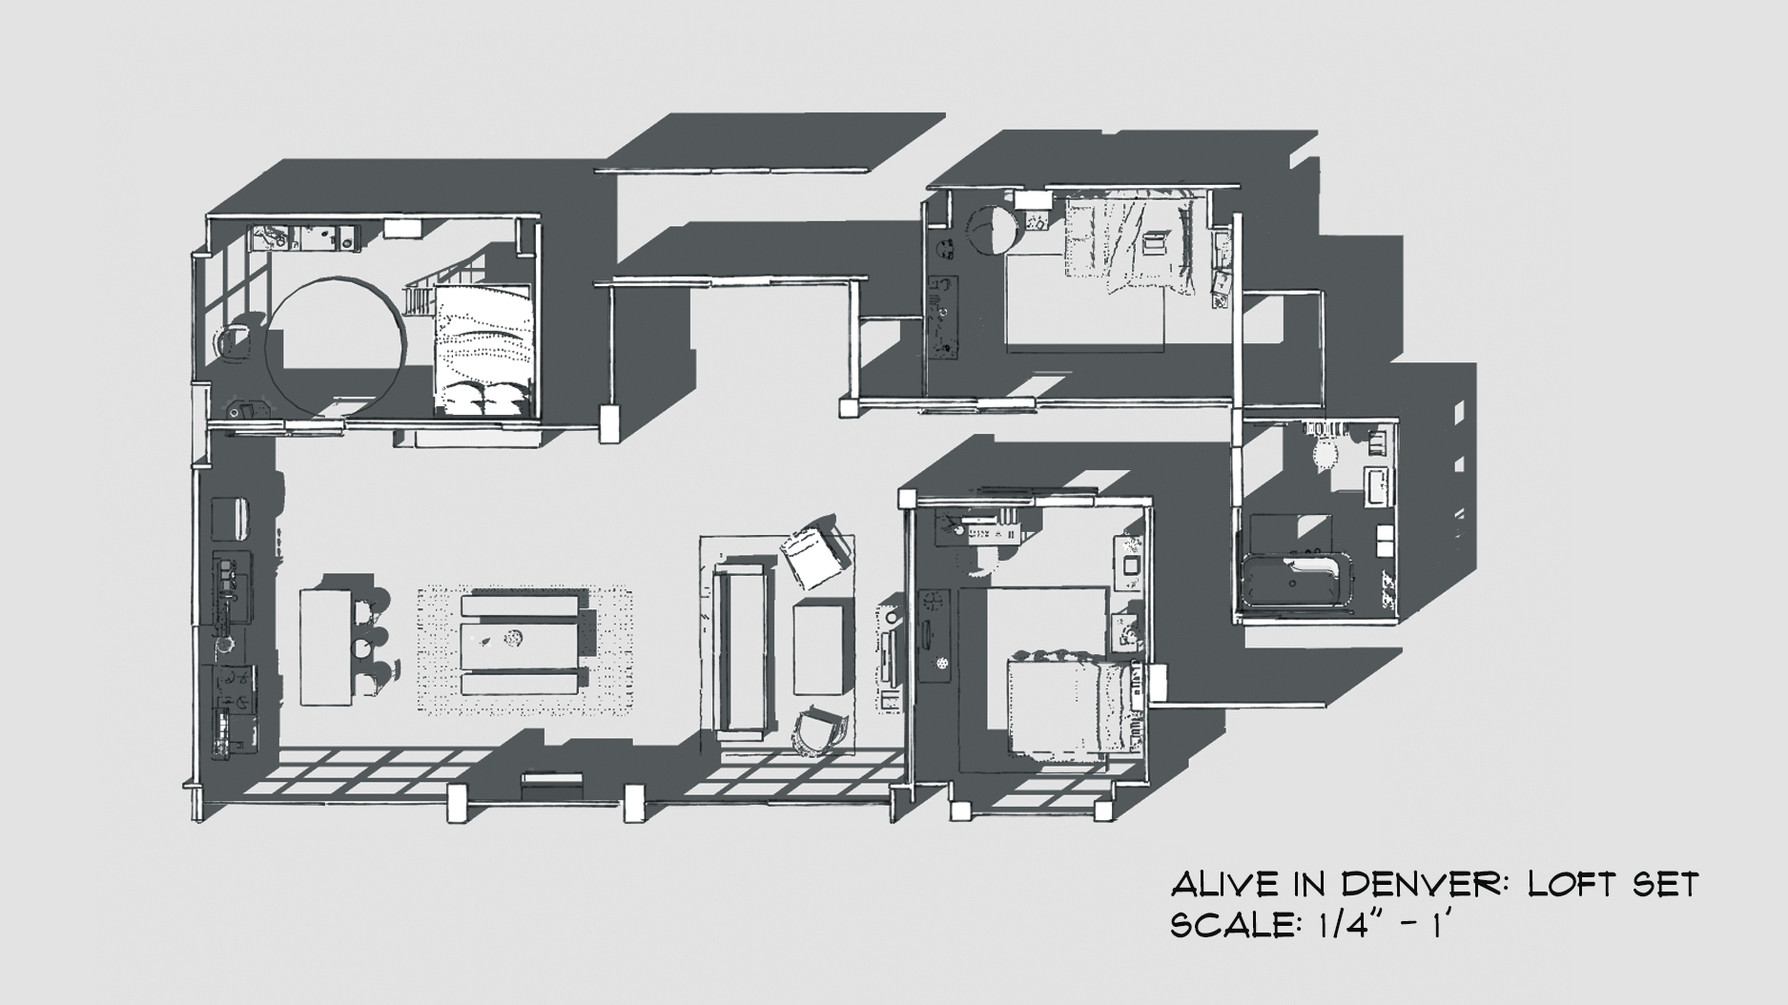 Loft Apartment Set Plan